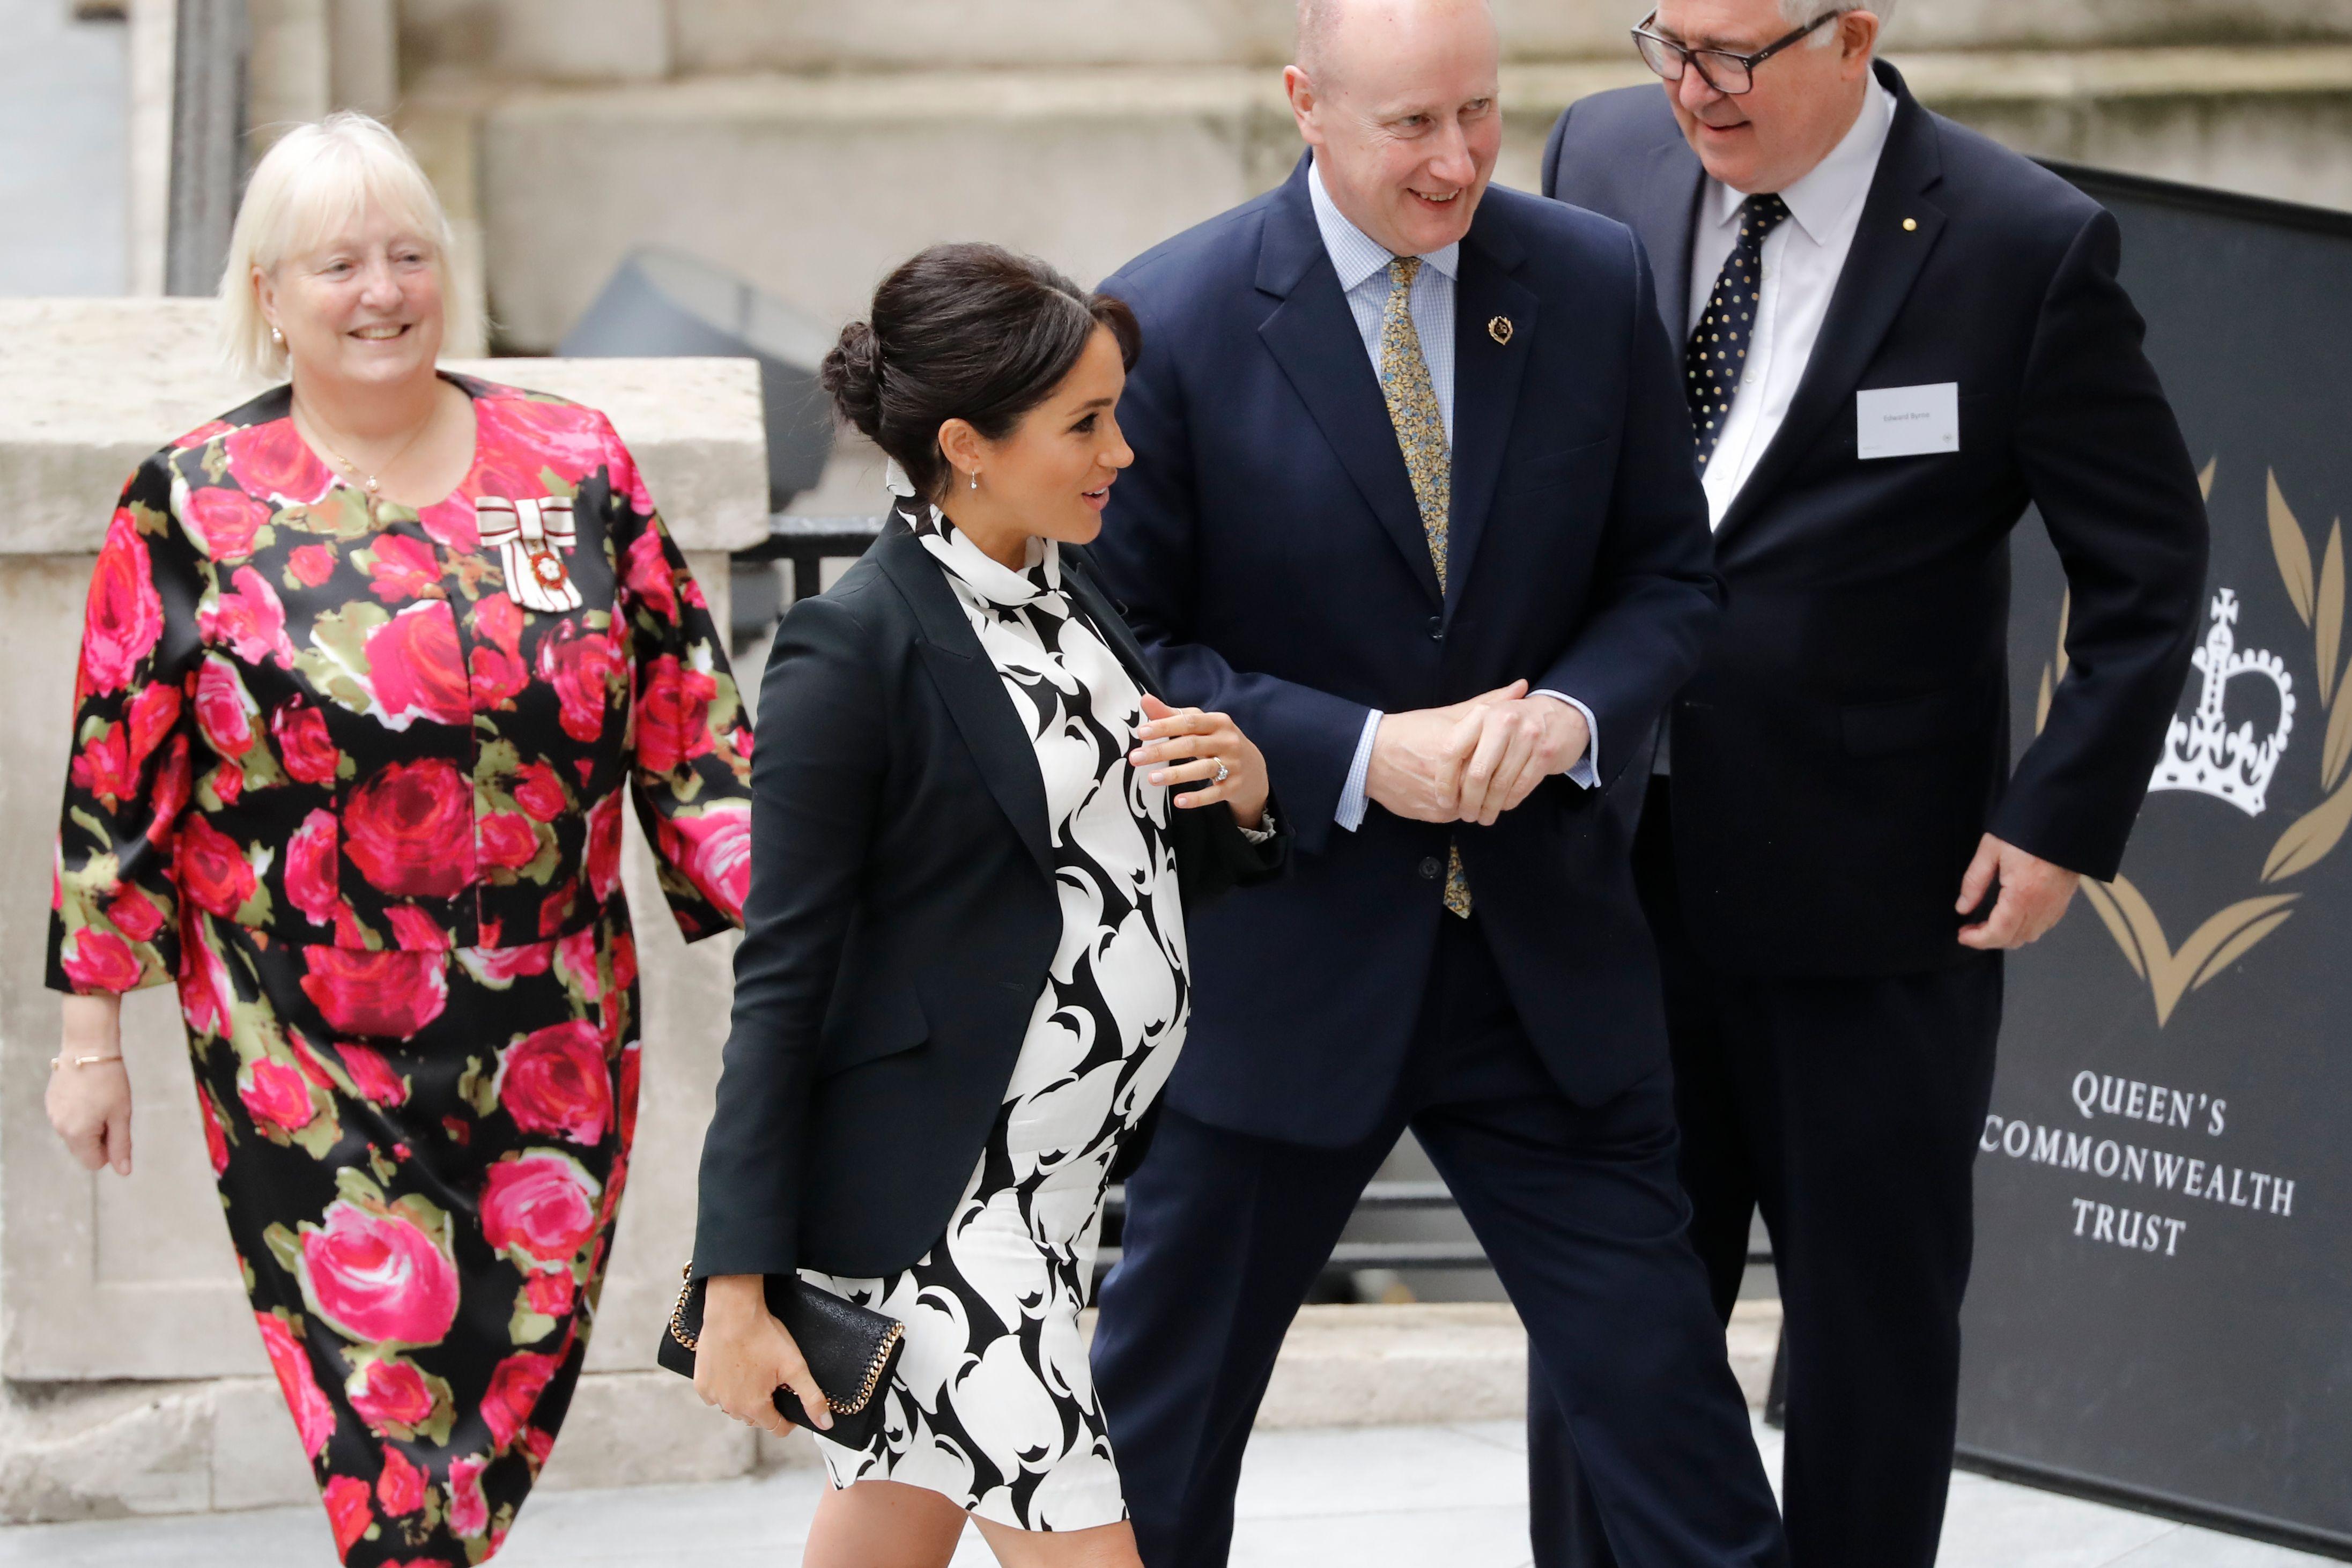 fc443c97 Meghan Markle Wears Suffragette White To Attend International Women's Day  Panel 2019